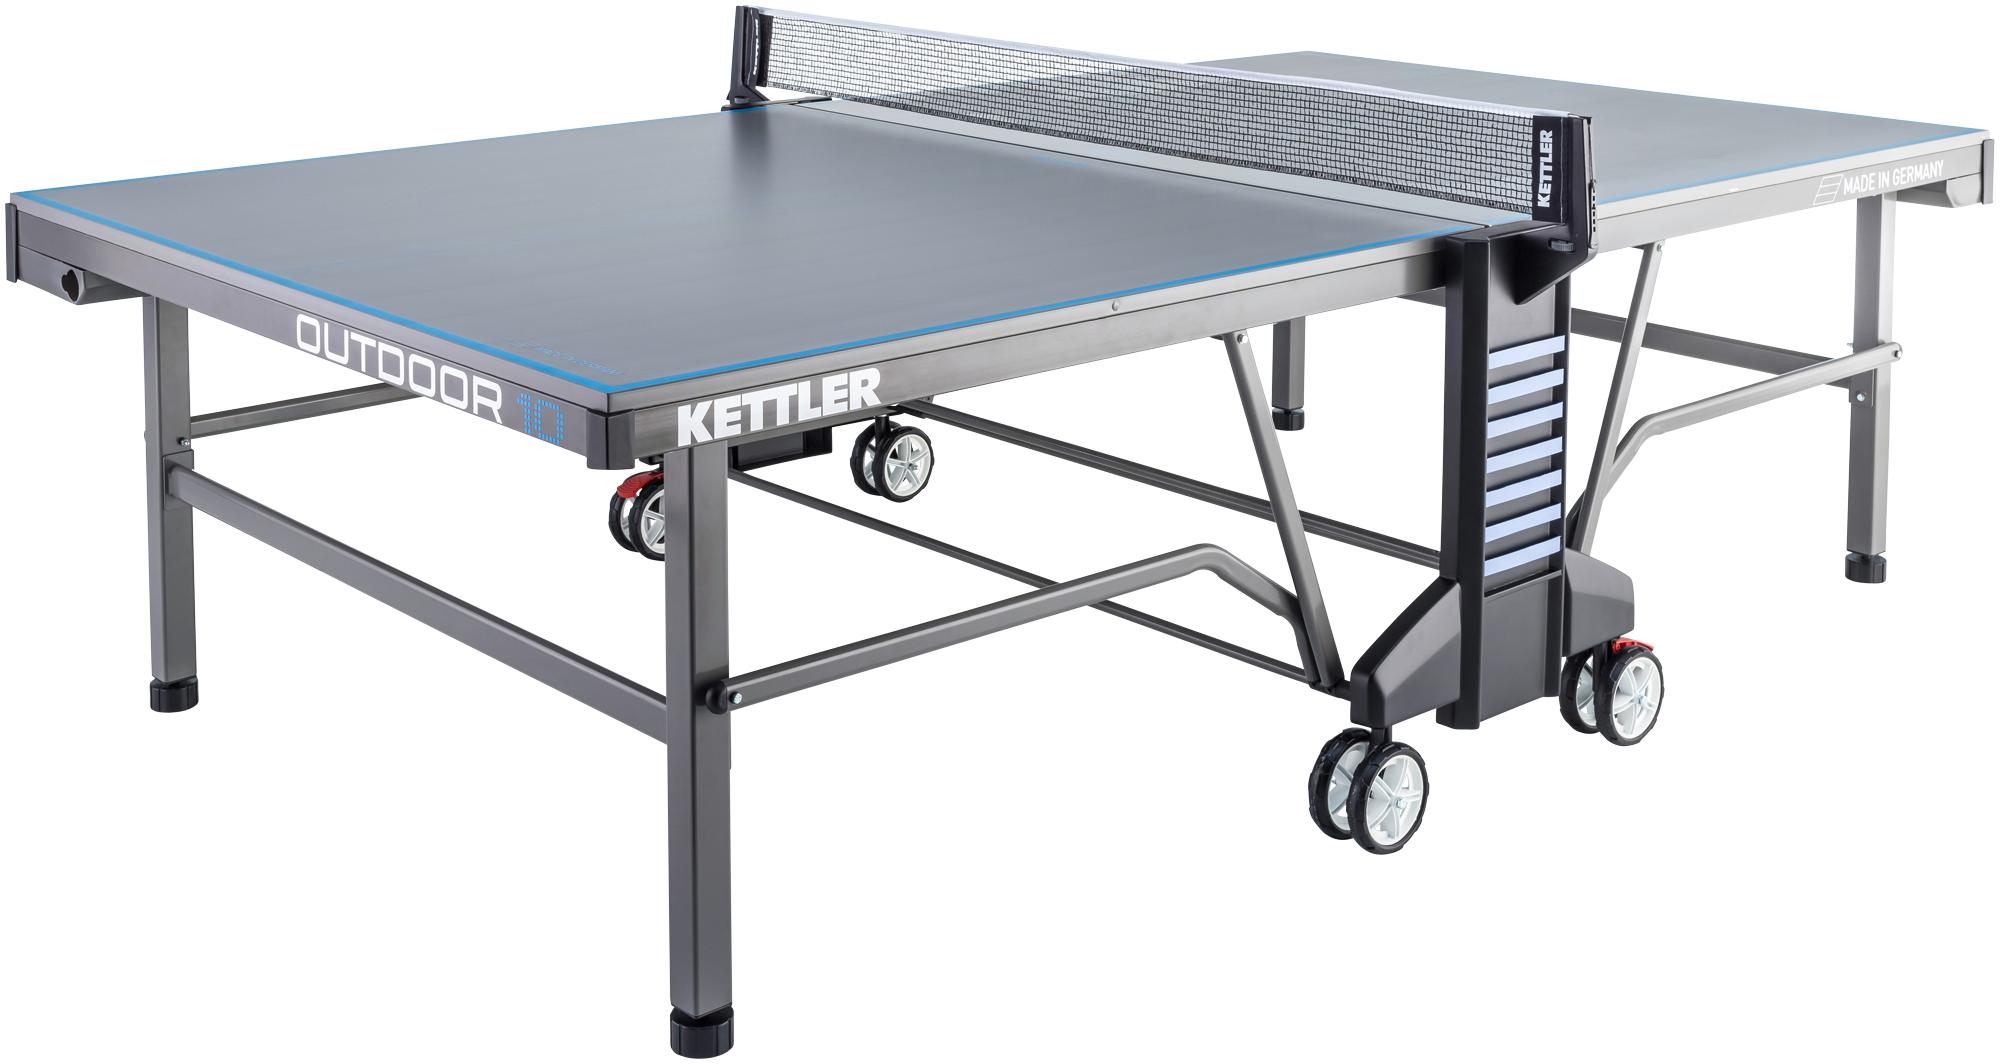 Kettler Теннисный стол Kettler Outdoor 10